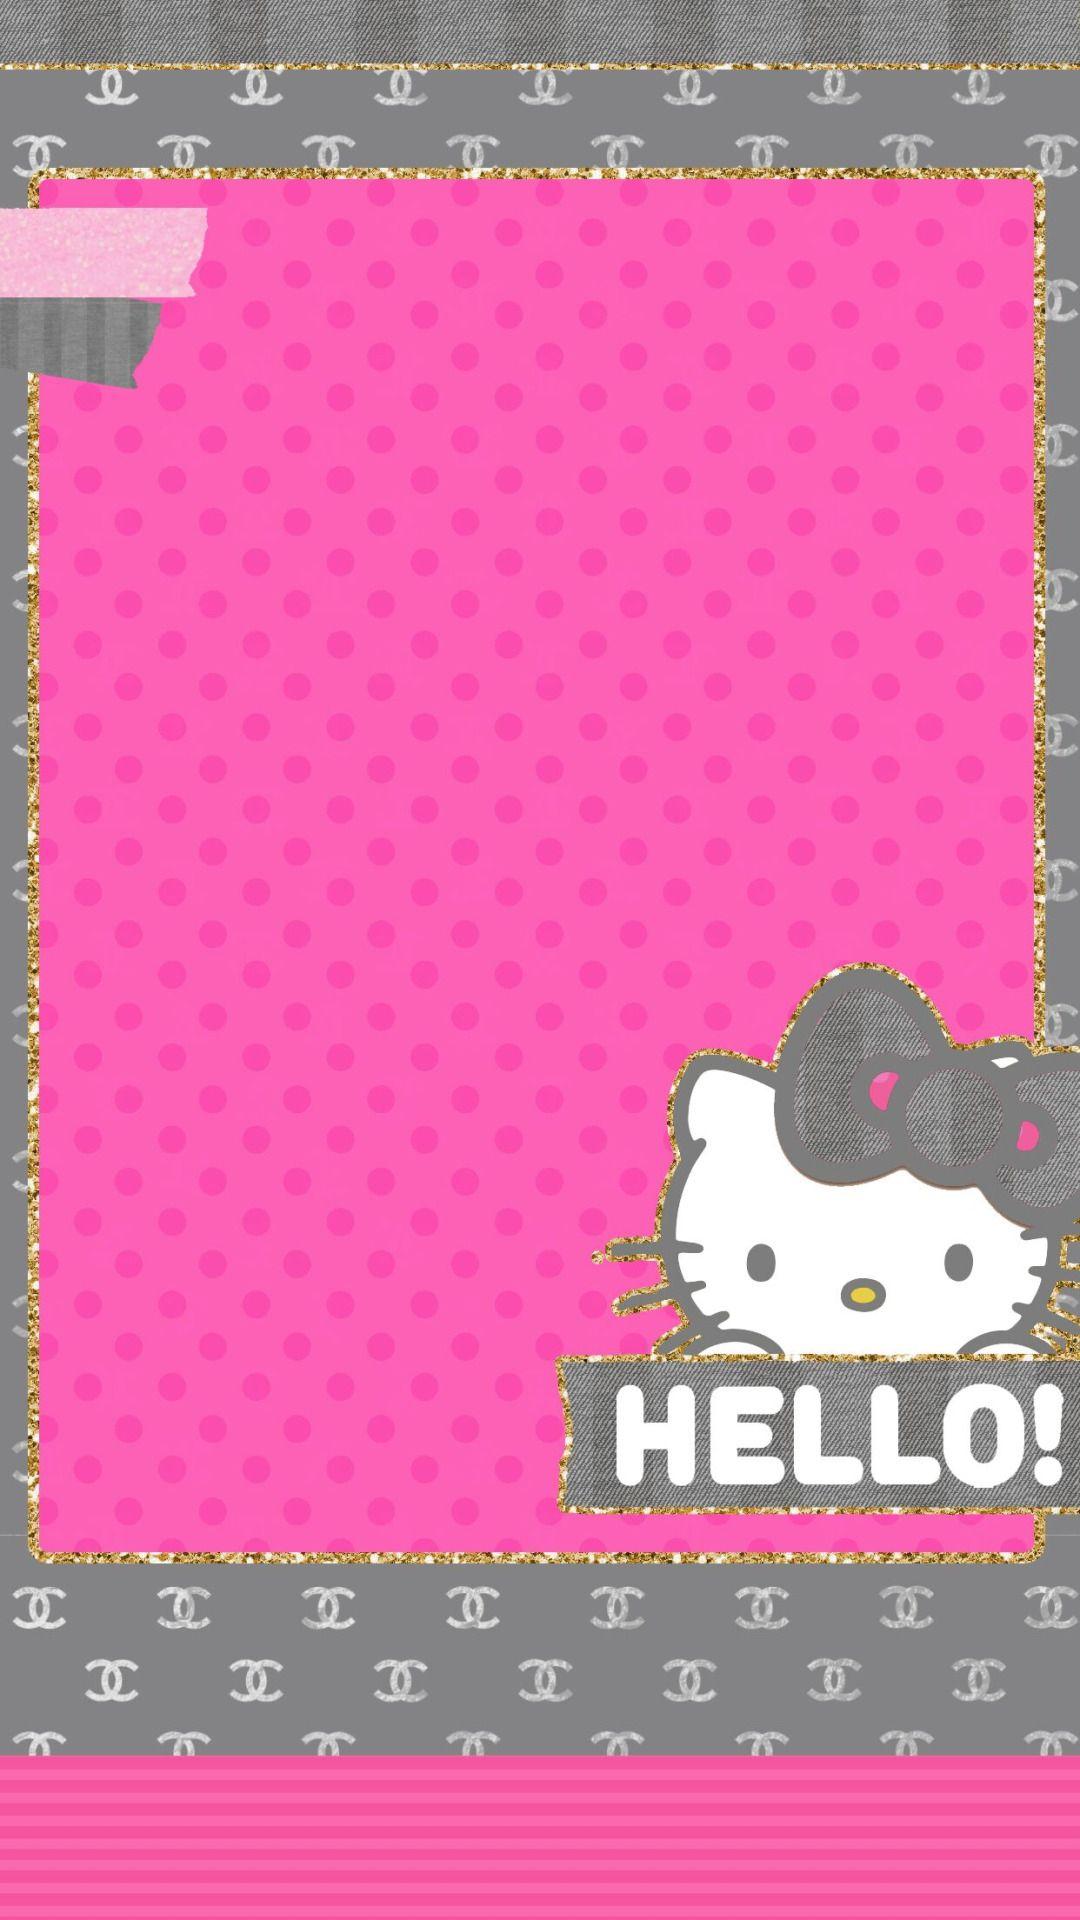 Most Inspiring Wallpaper Hello Kitty Pink - 9475b56f19b64c617b3a4f8fd4752ee7  Photograph_336550.jpg